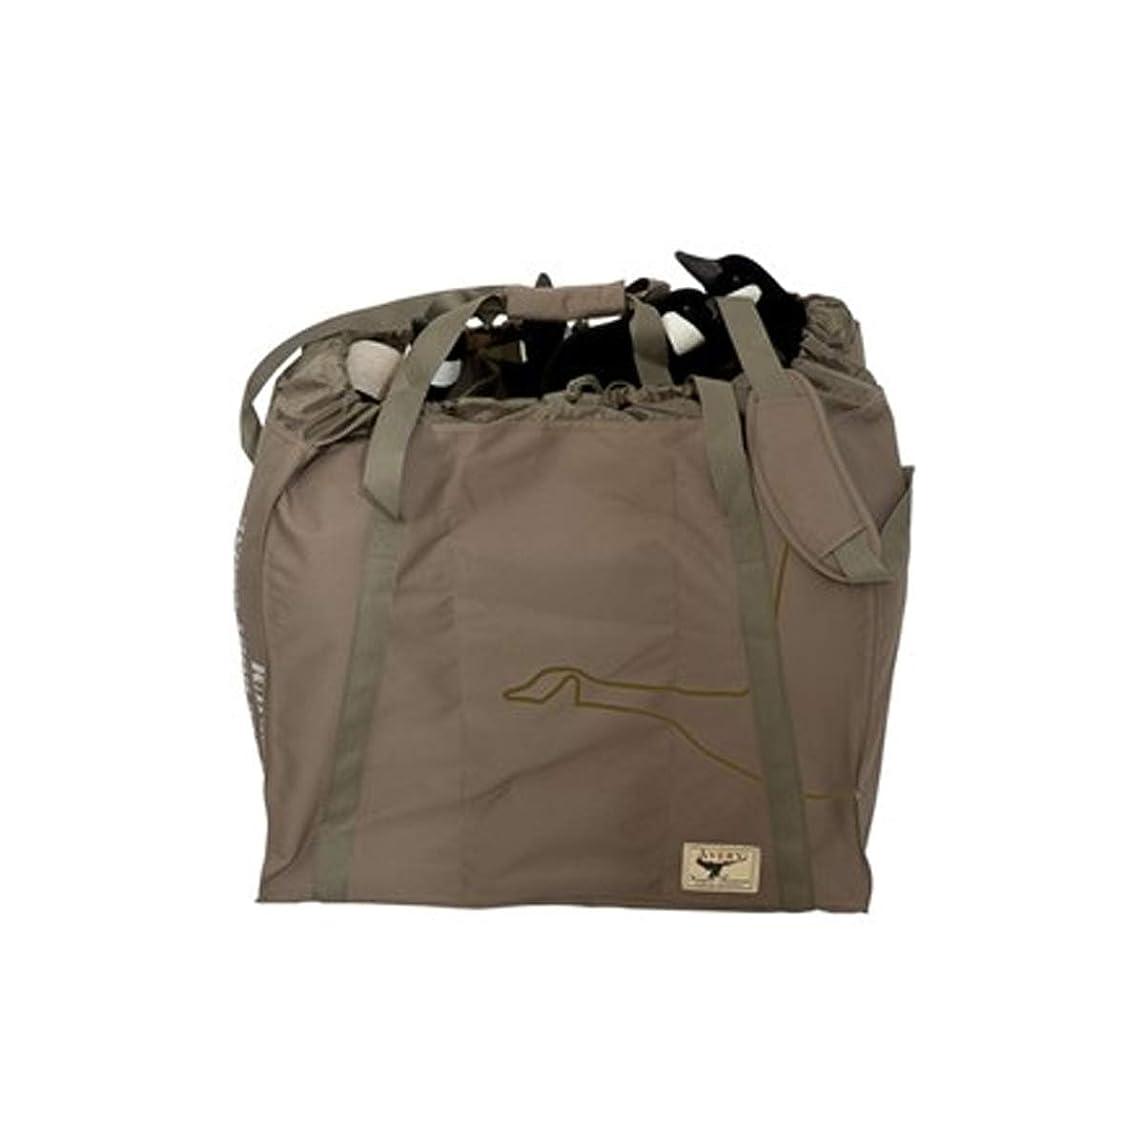 Avery Hunting Gear Cinch-Top Decoy Bag 6 FB Geese